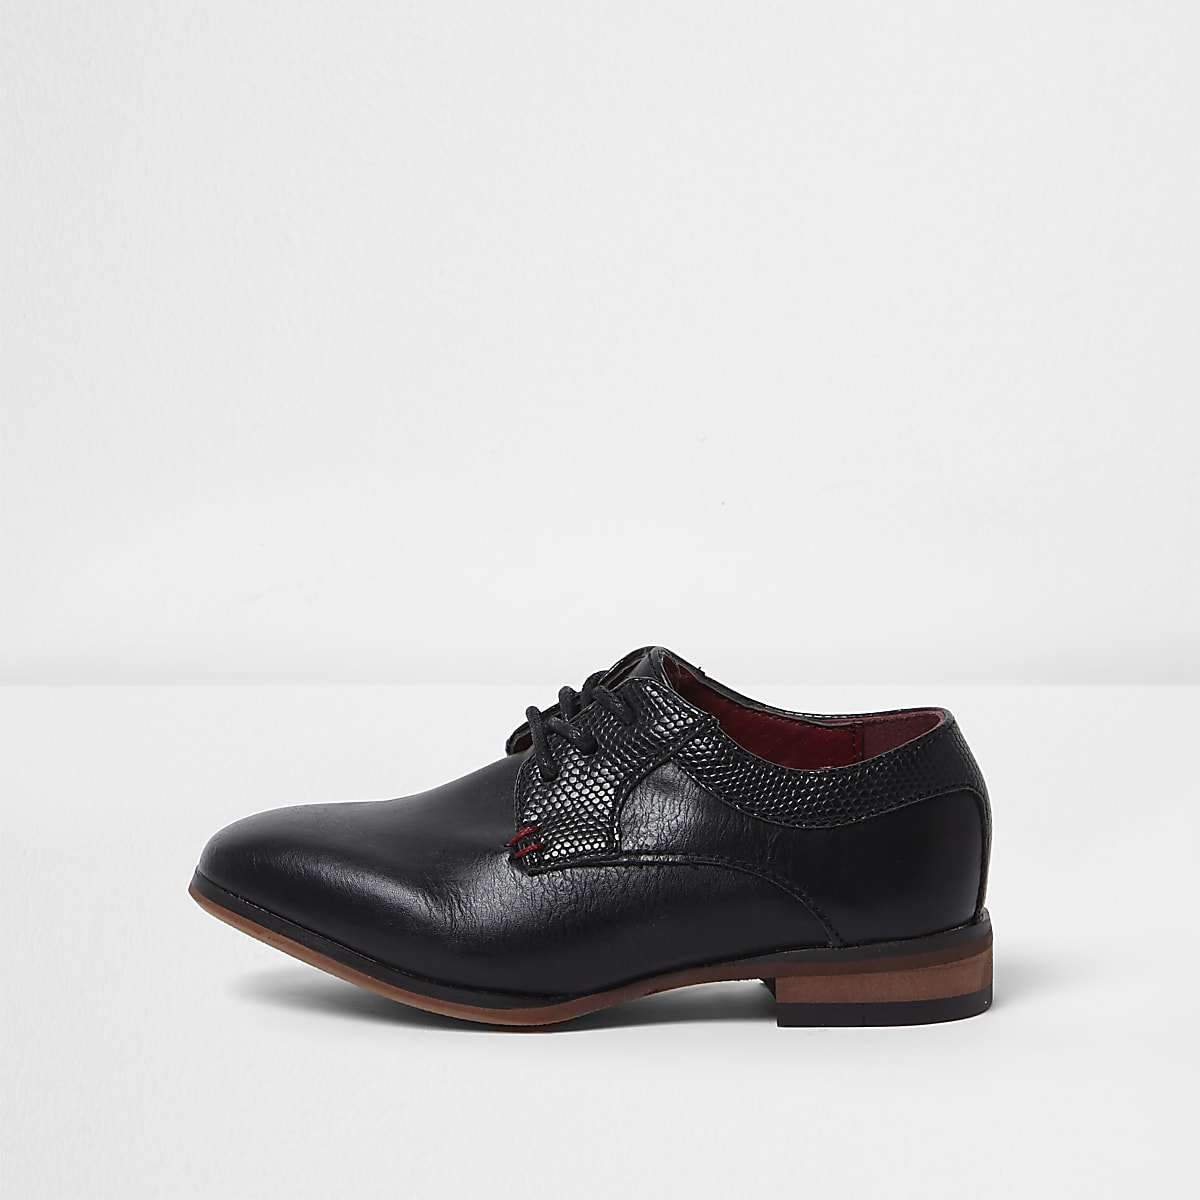 45677f2c86647 Mini boys black pointed brogue shoes - Baby Boys Shoes - Baby Boys Shoes    Boots - Mini Boys - boys